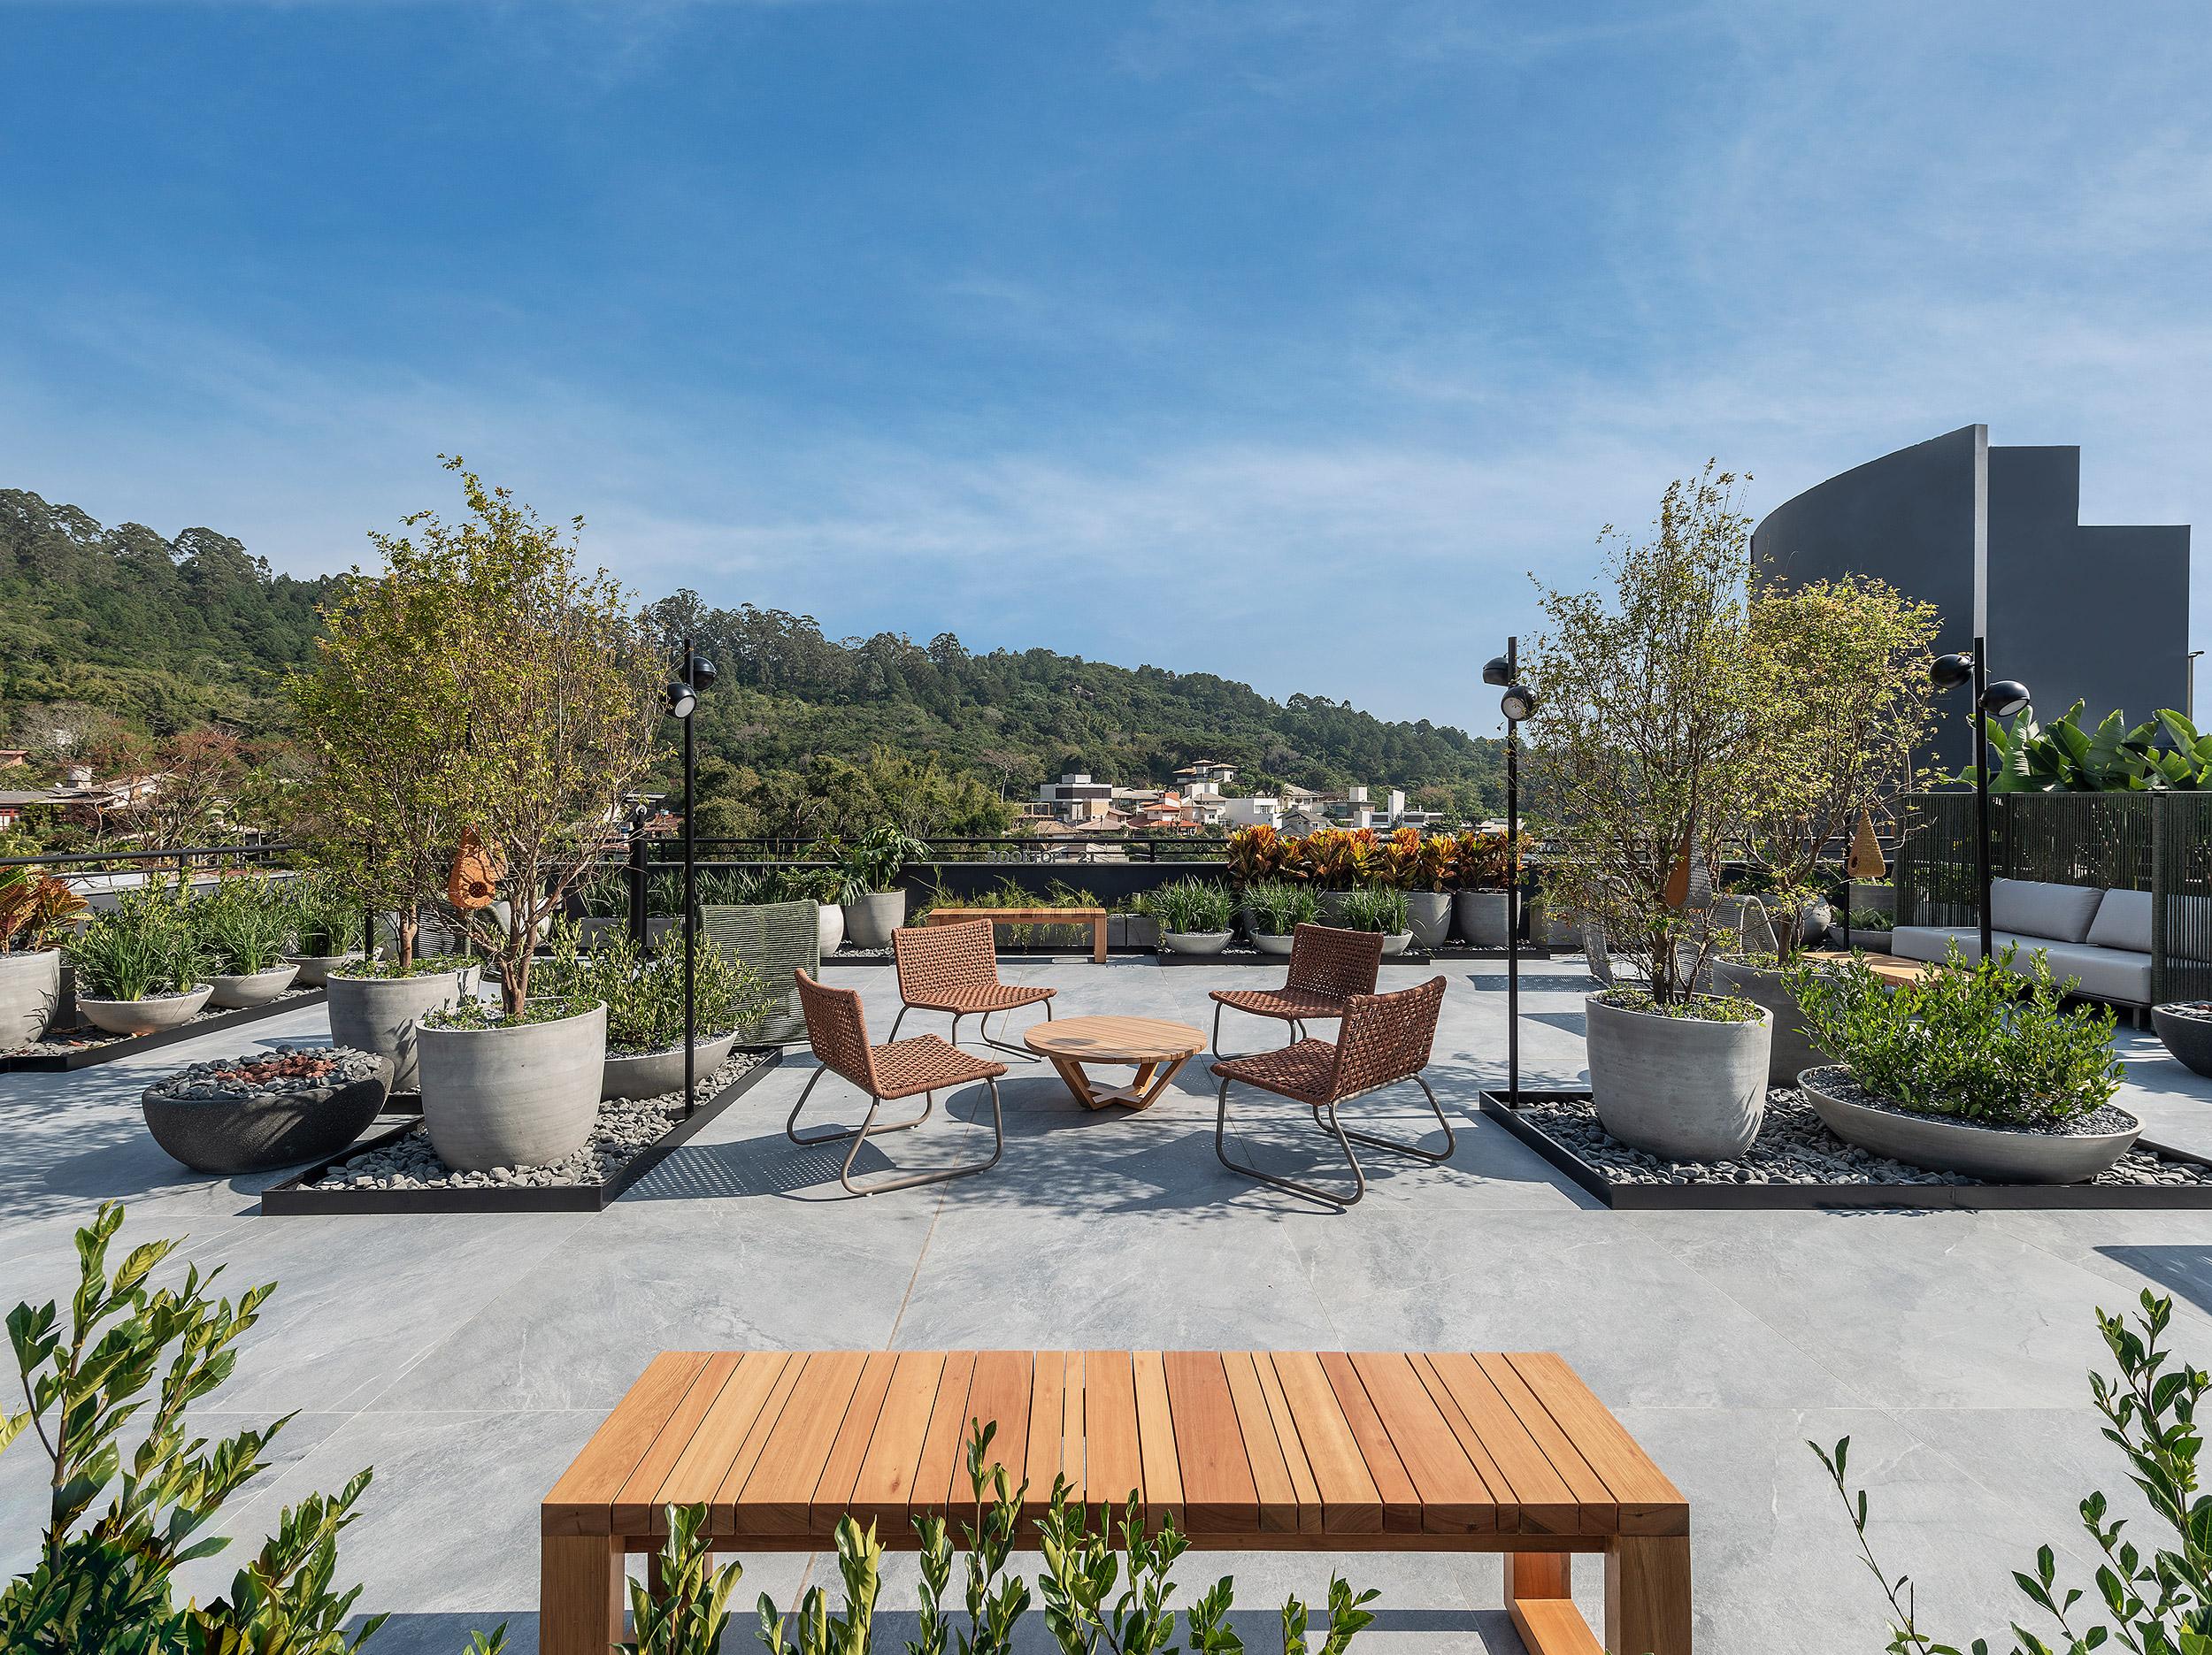 Rooftop 20 I 21 - Ana Trevisan | Paisagismo + Arquitetura